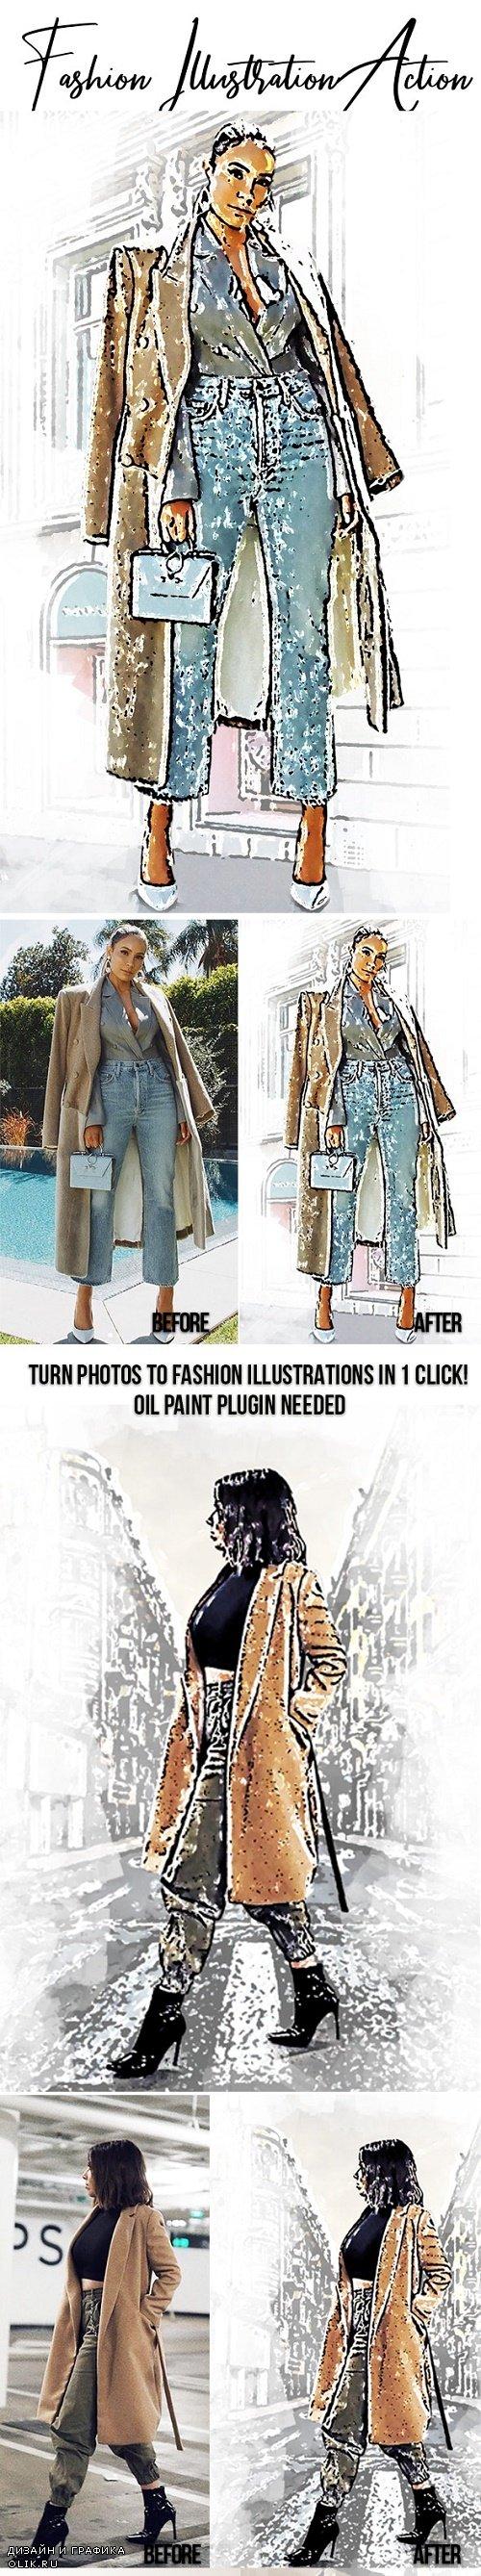 Fashion Illustration Effect 23766073